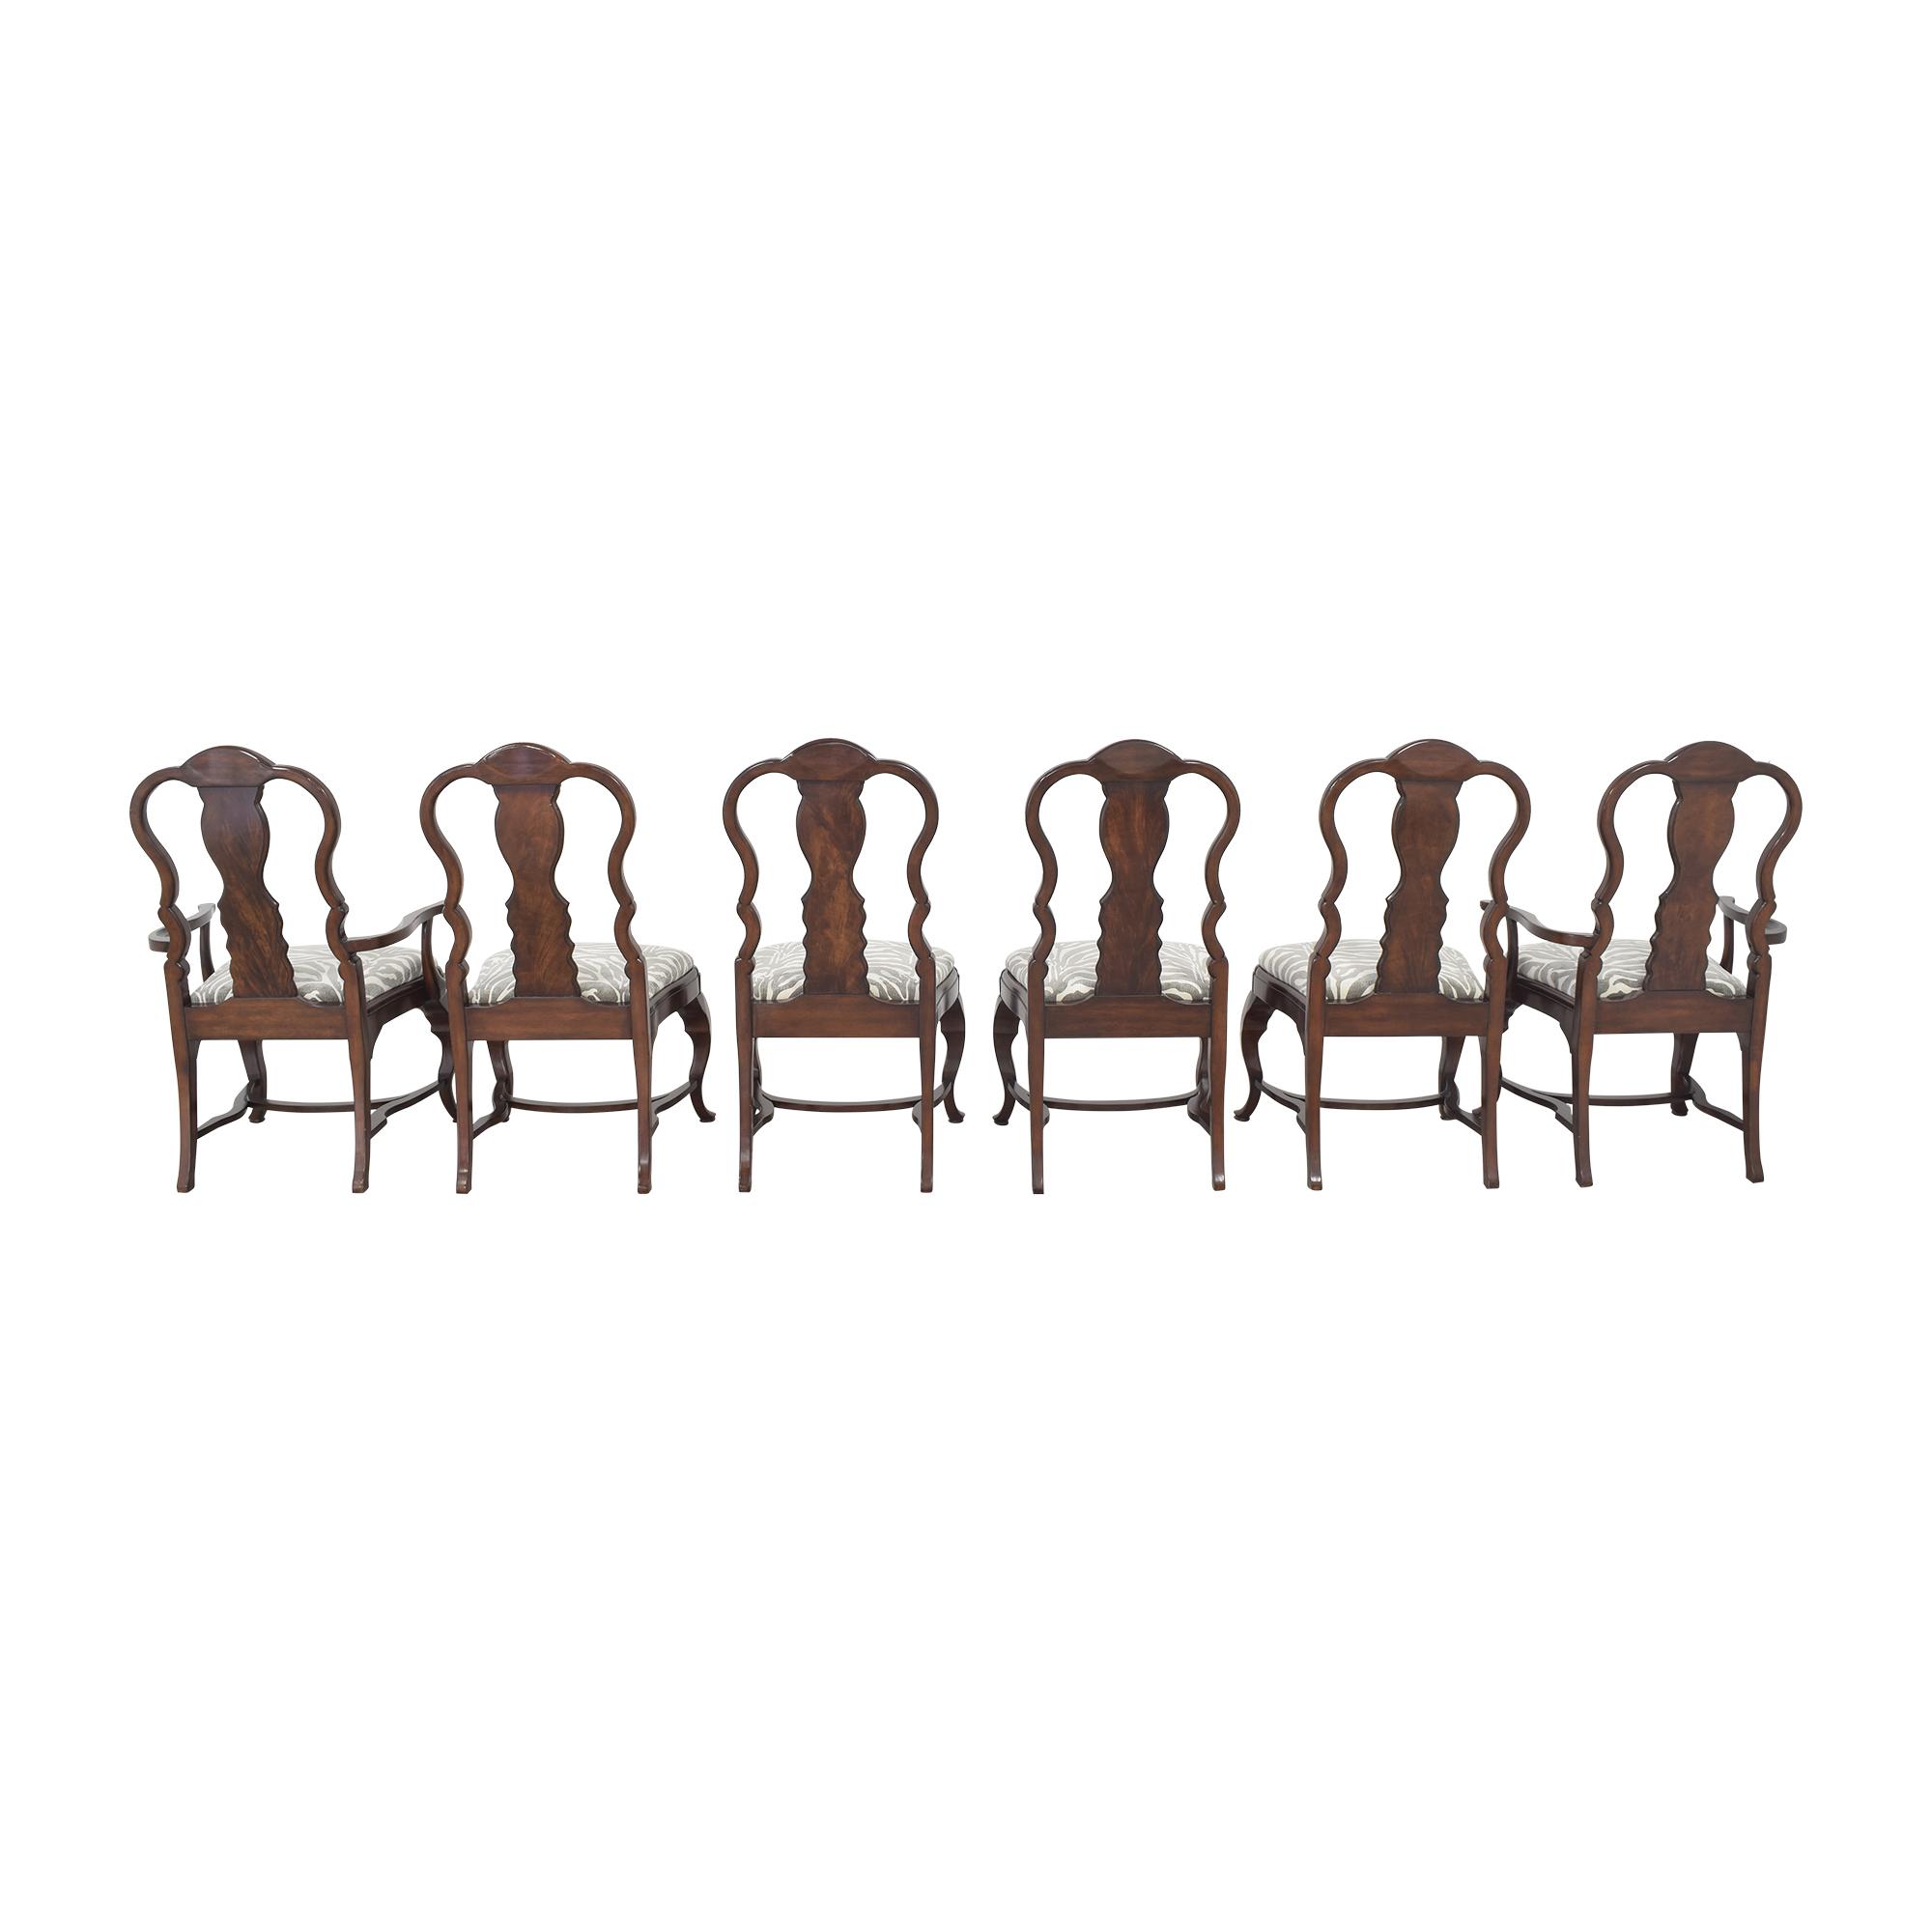 Bernhardt Bernhardt Upholstered Dining Chairs price